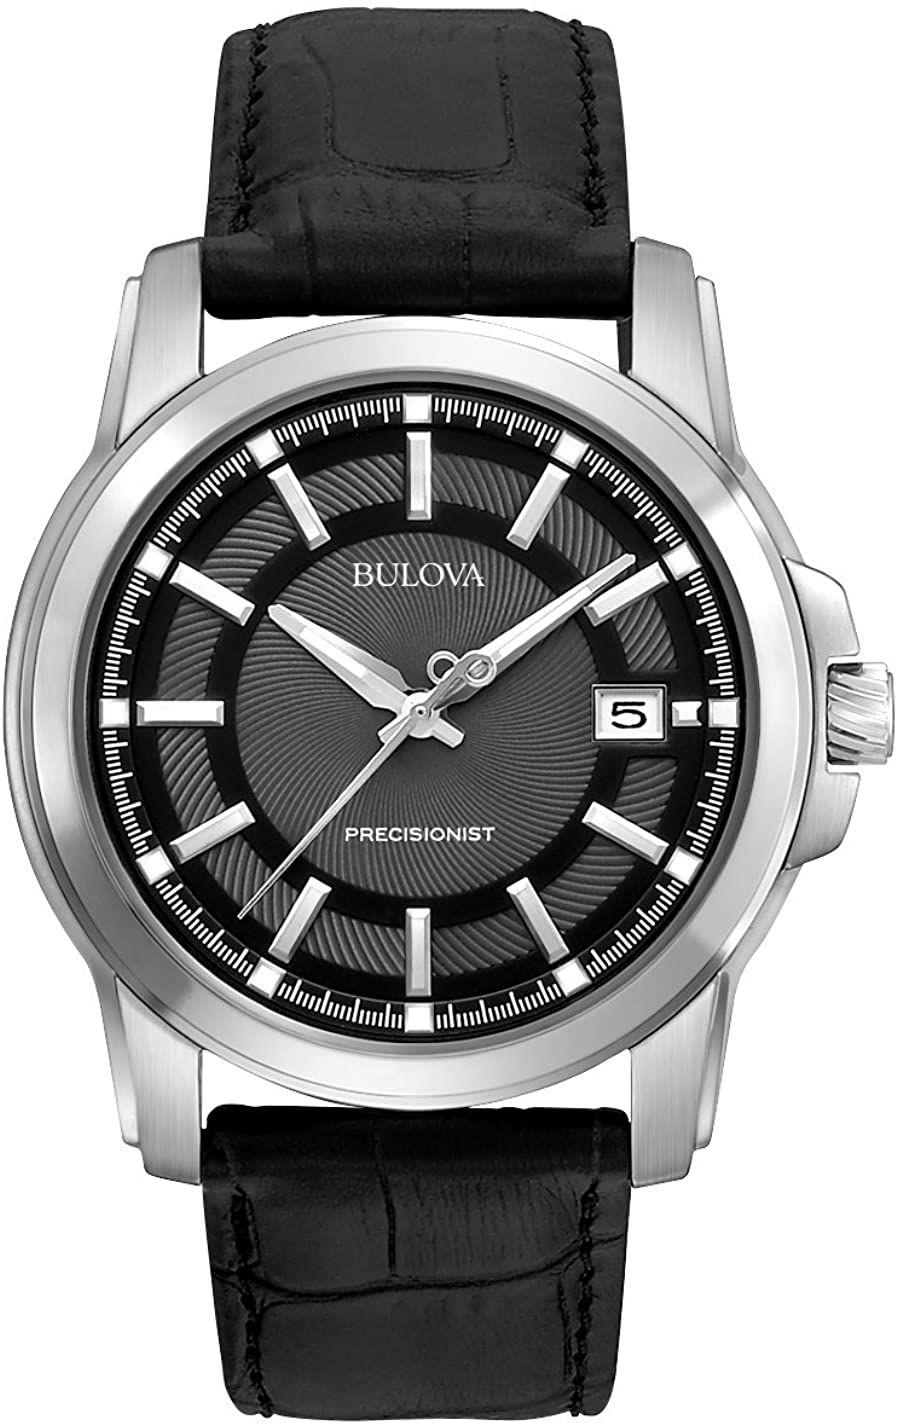 Bulova Men's 96B158 Watch